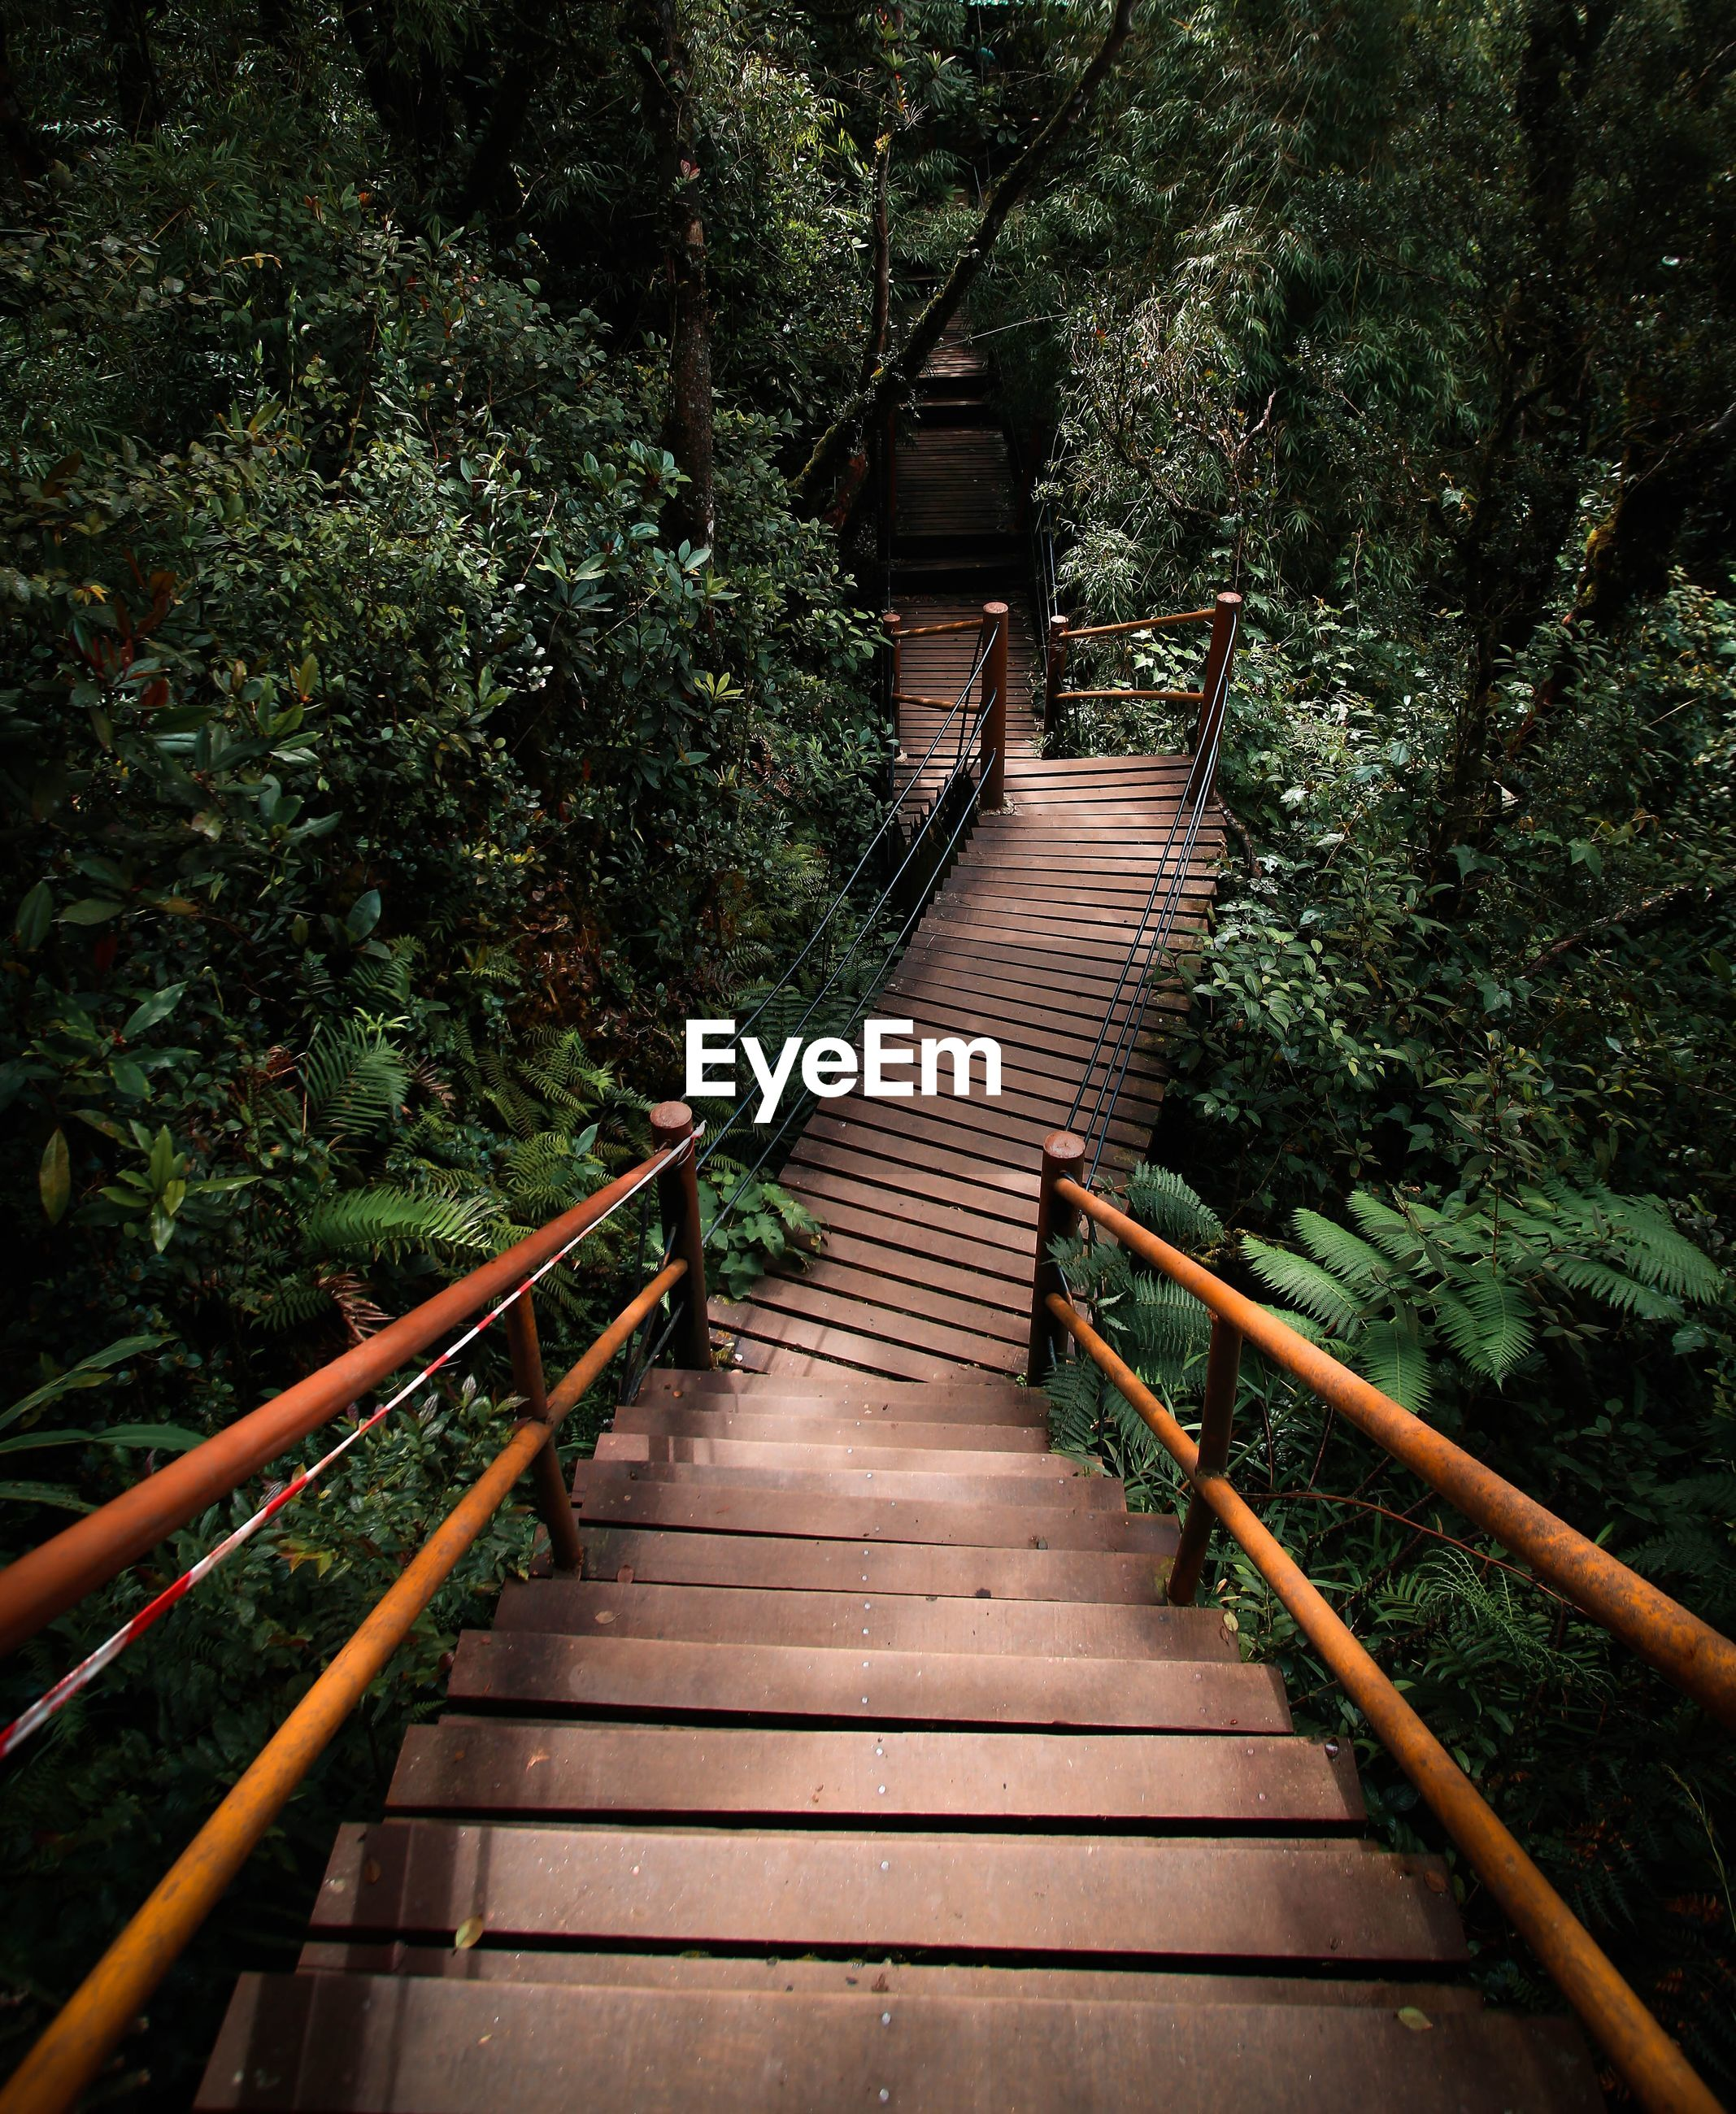 Wooden footbridge over trees in forest